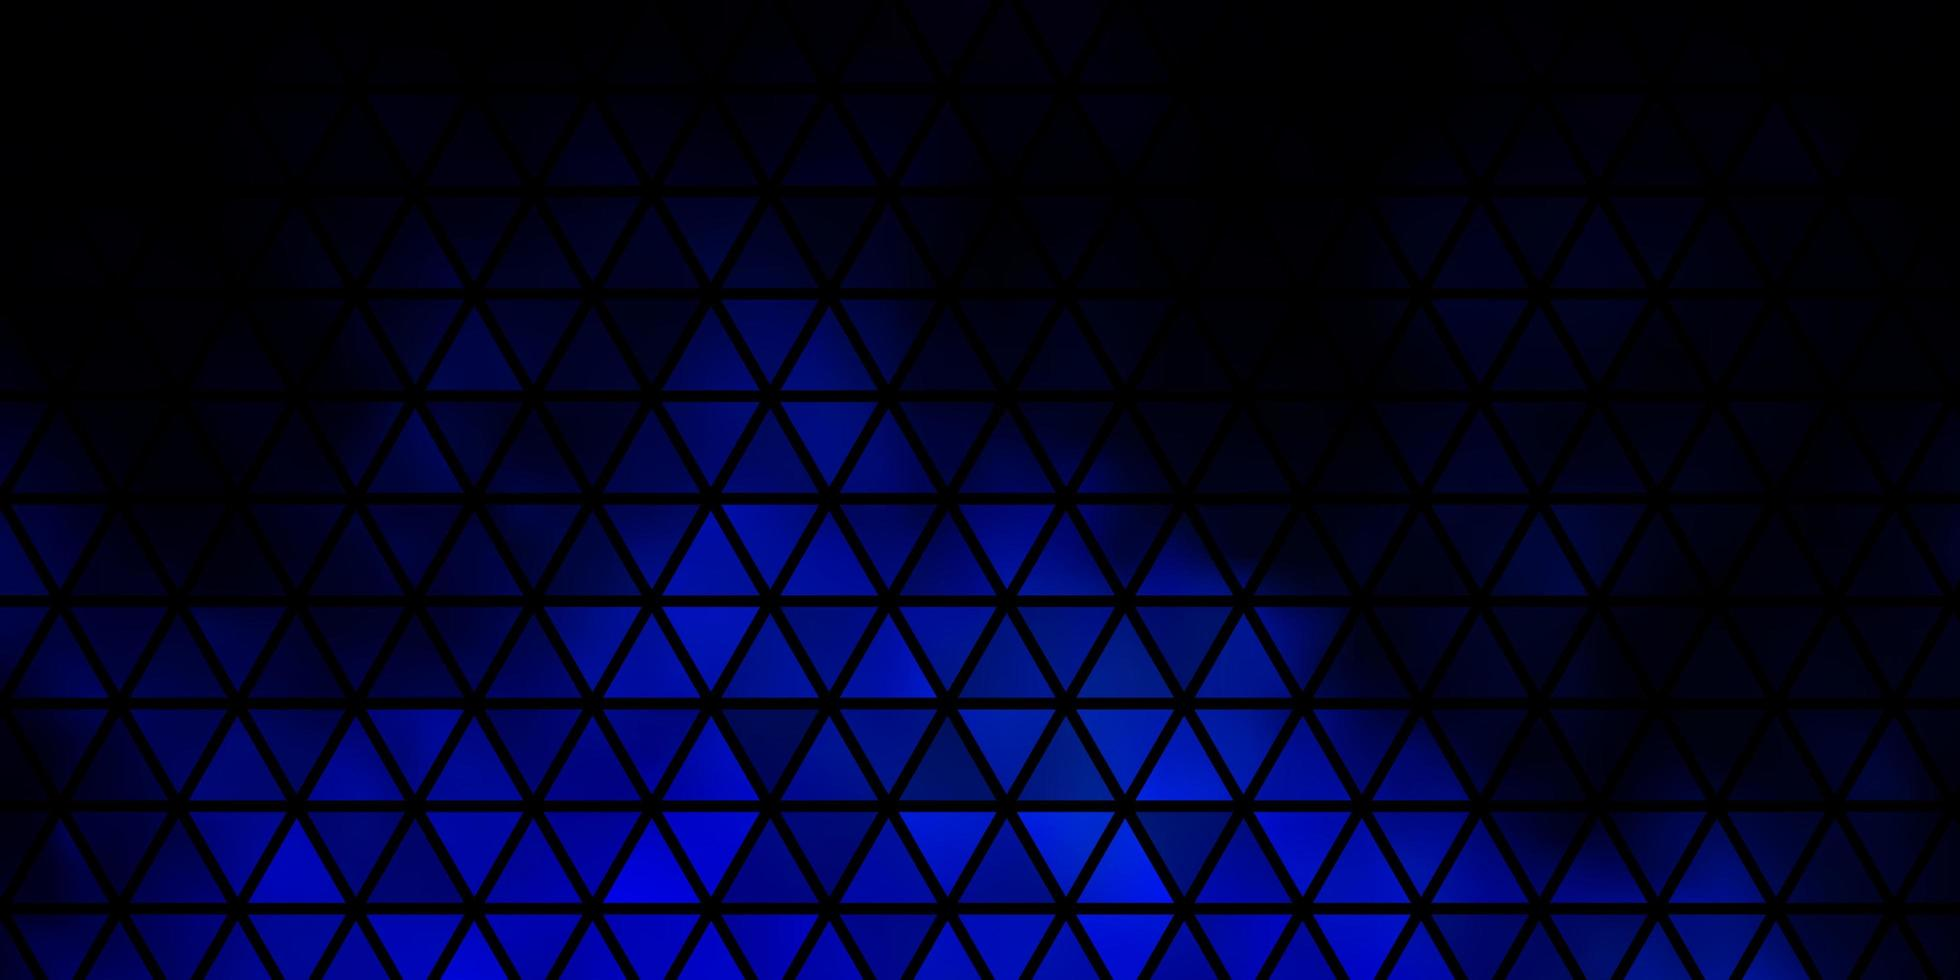 Dark BLUE vector texture with triangular style.